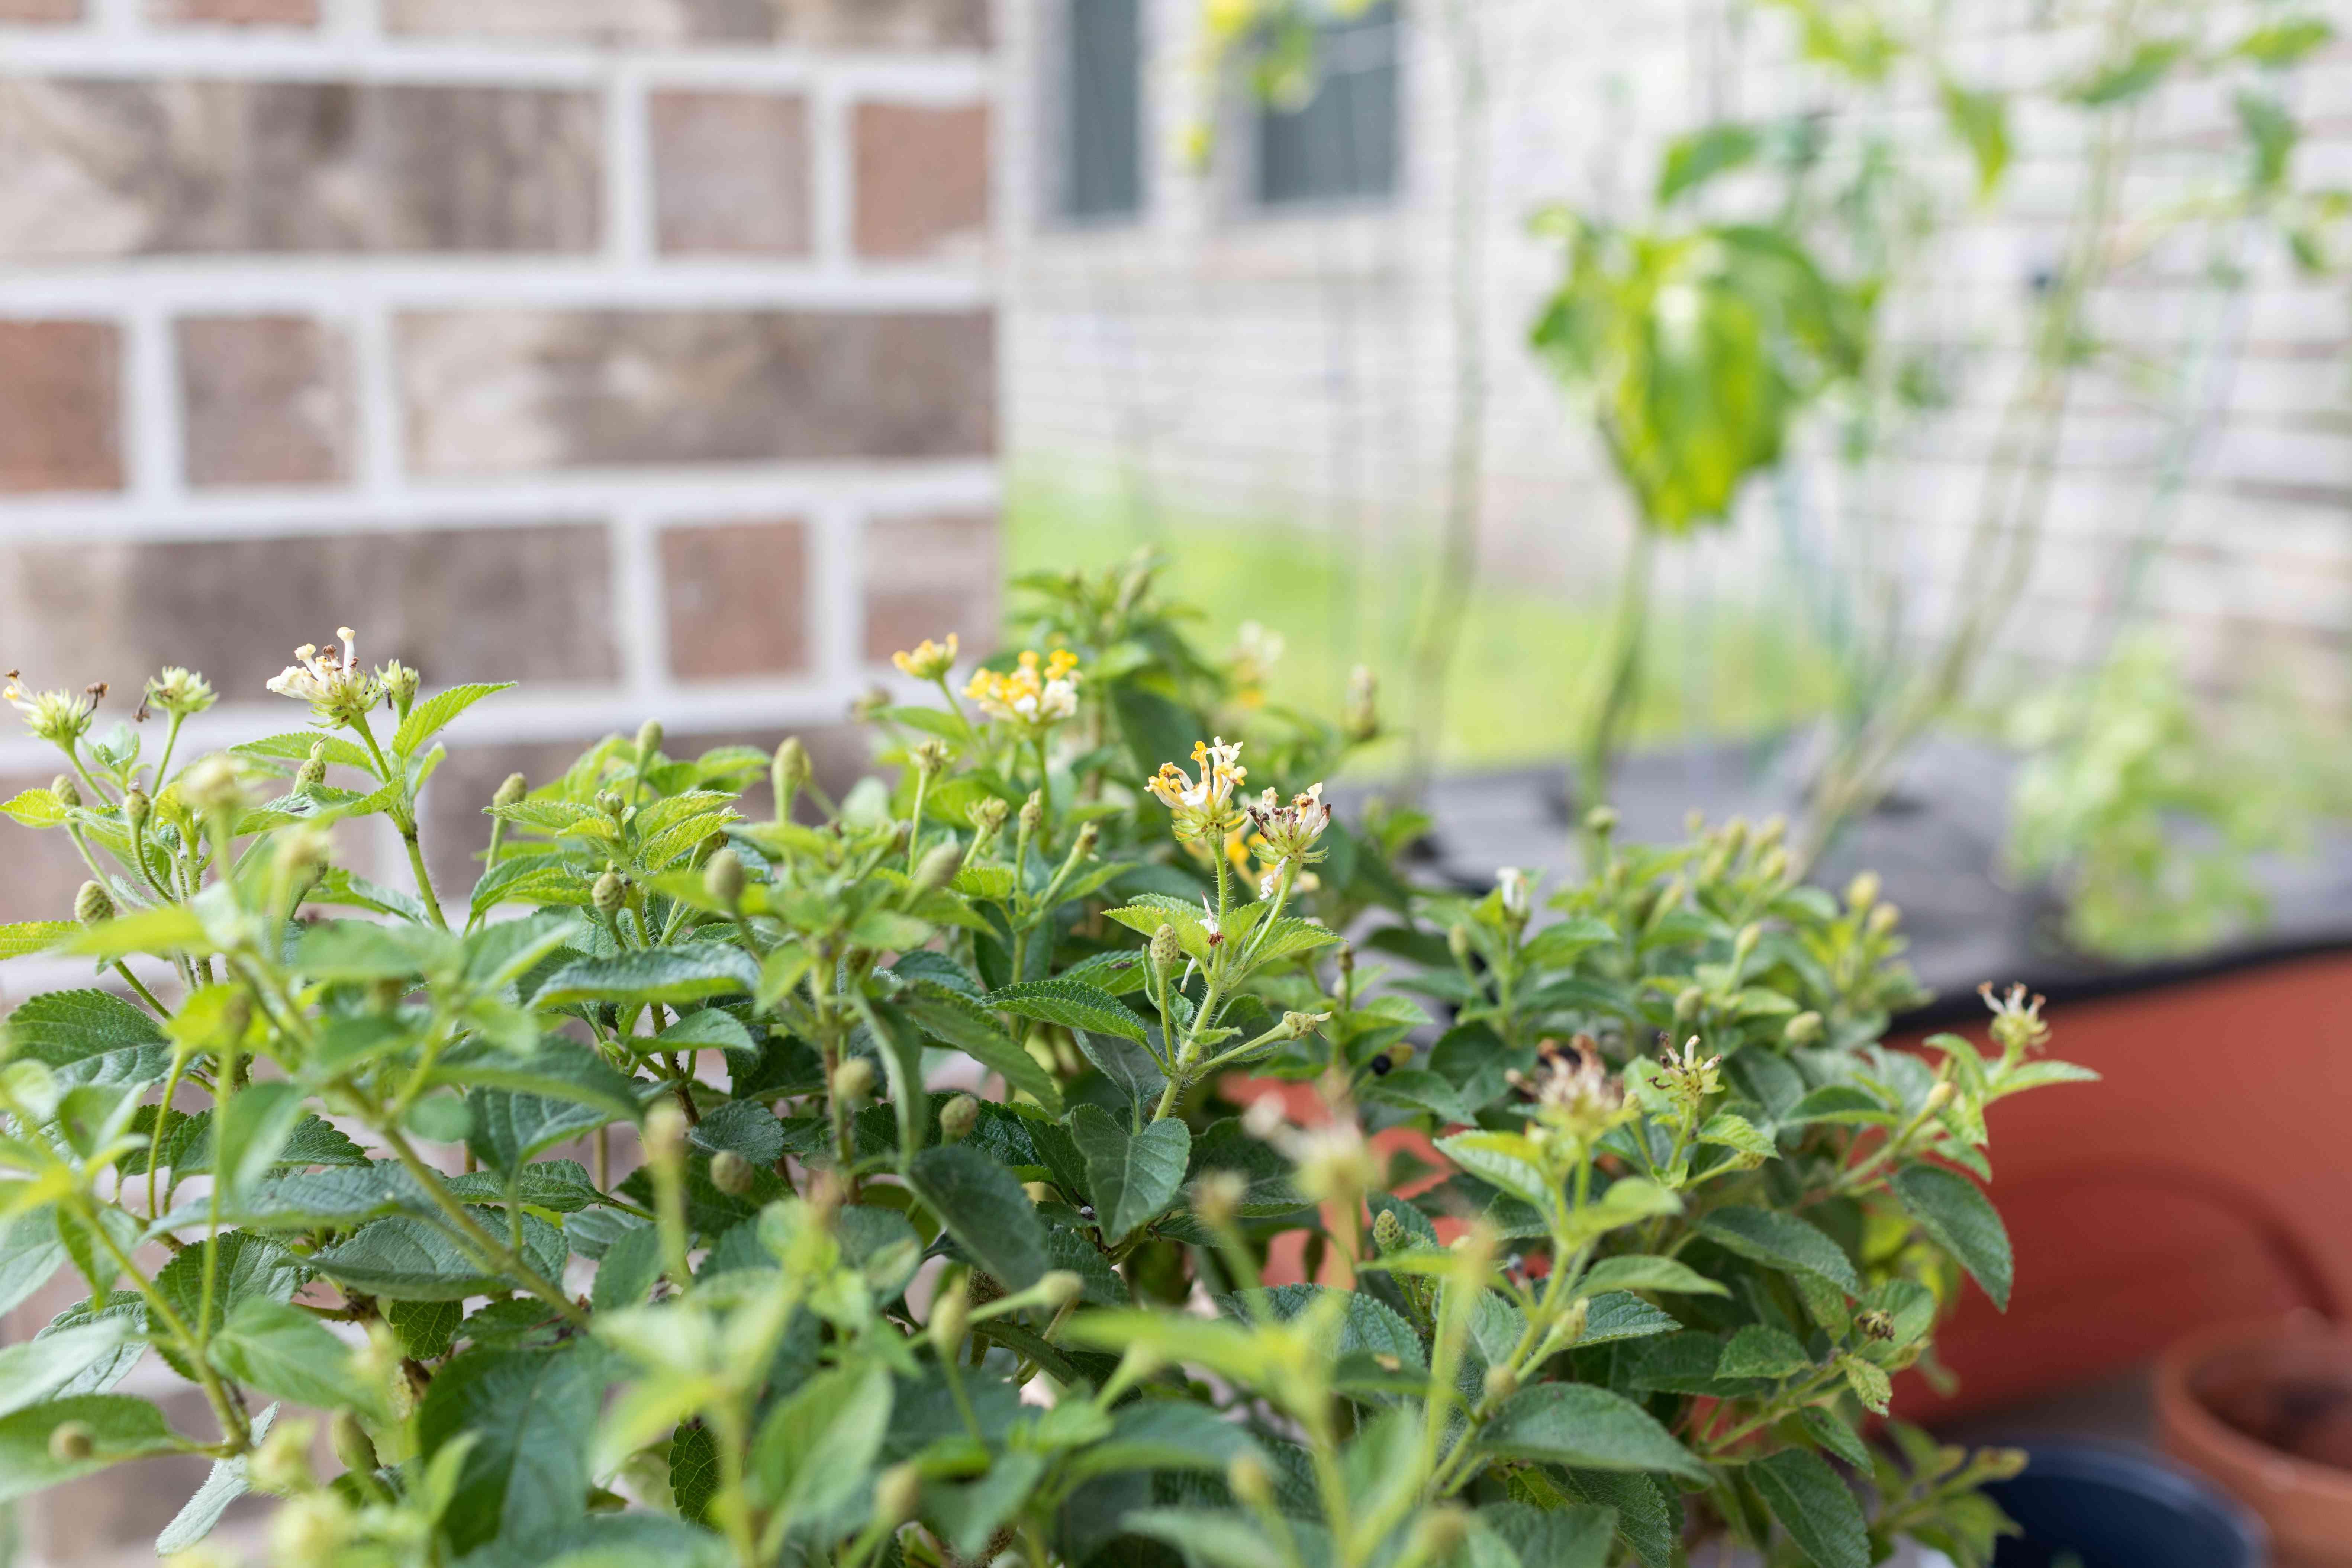 Flowering lemon balm grows outside in pot on brick-walled patio